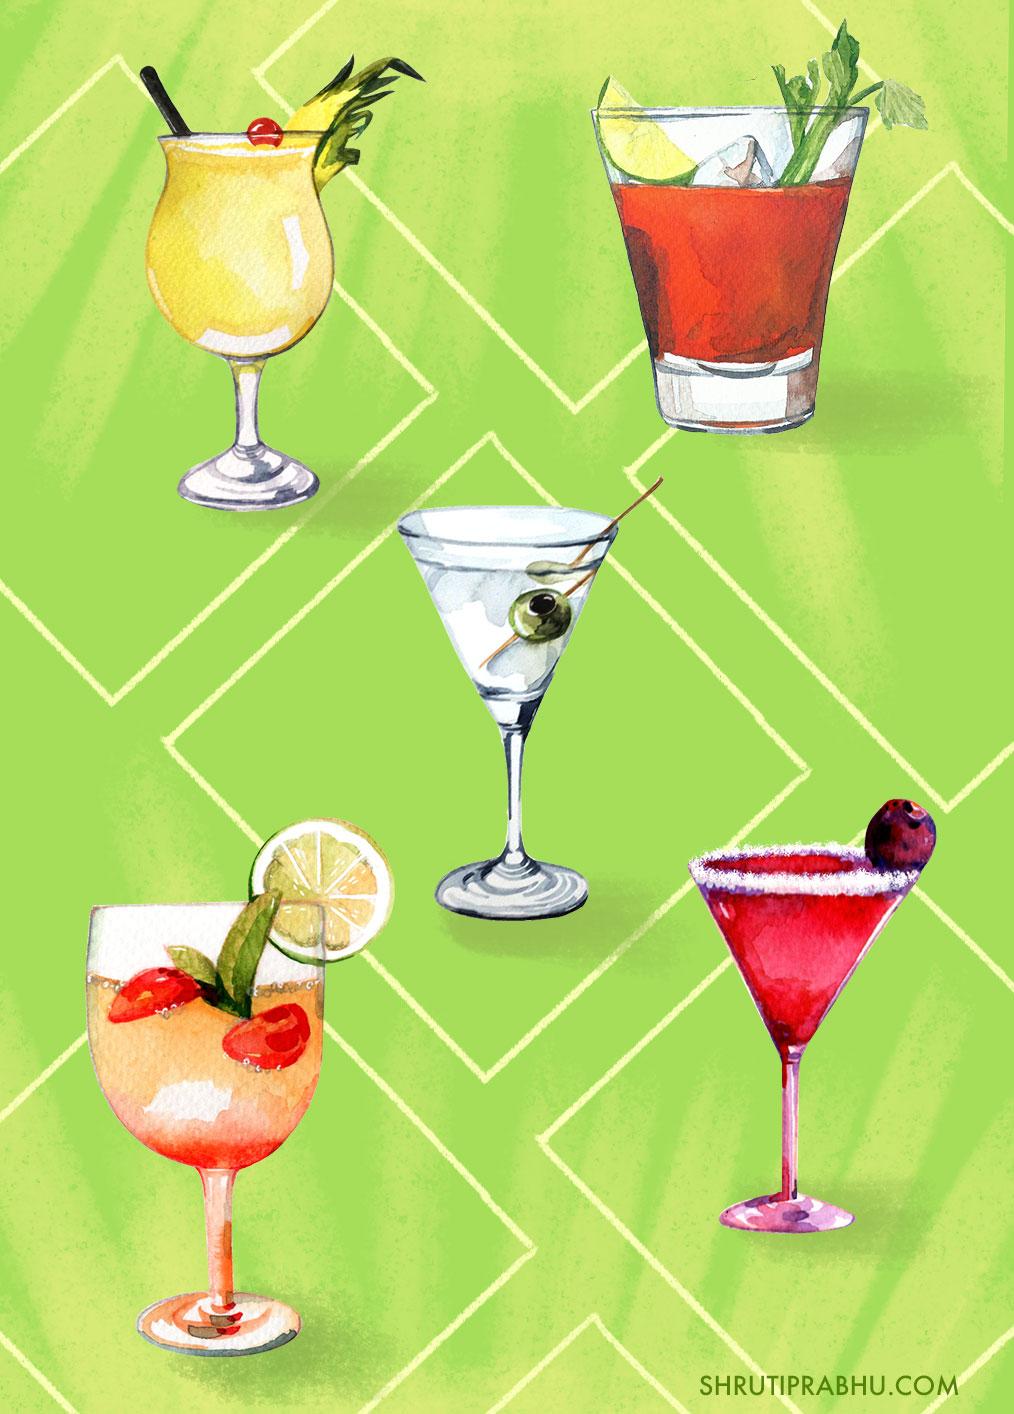 https://shrutiprabhu.com/wp-content/uploads/2019/07/ShrutiPrabhu_FoodIllustration_Cocktail.jpg